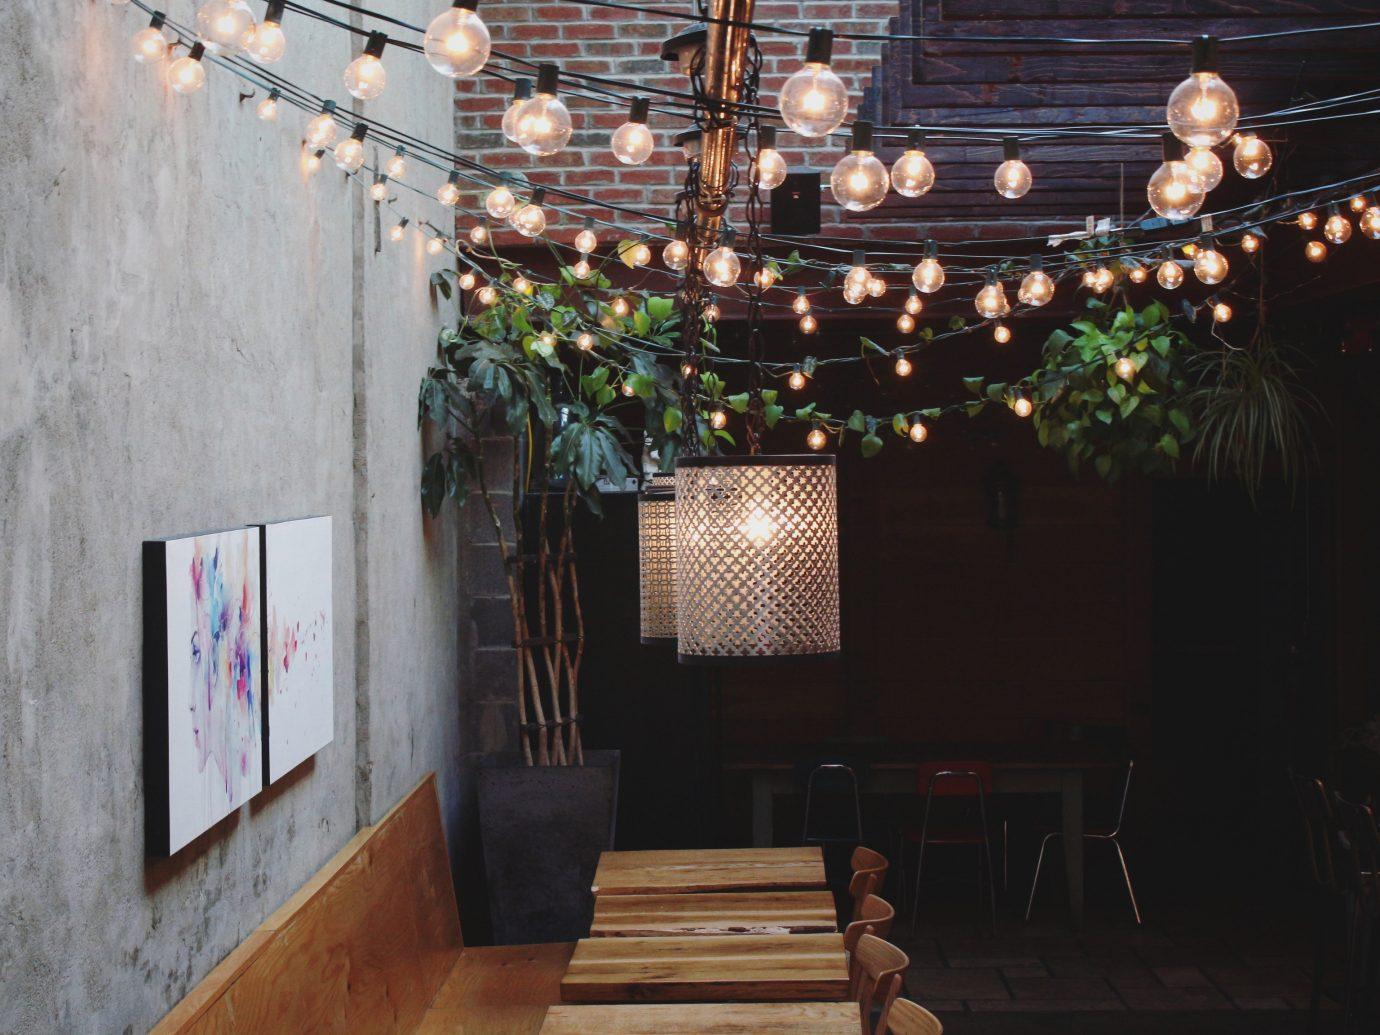 Food + Drink interior design